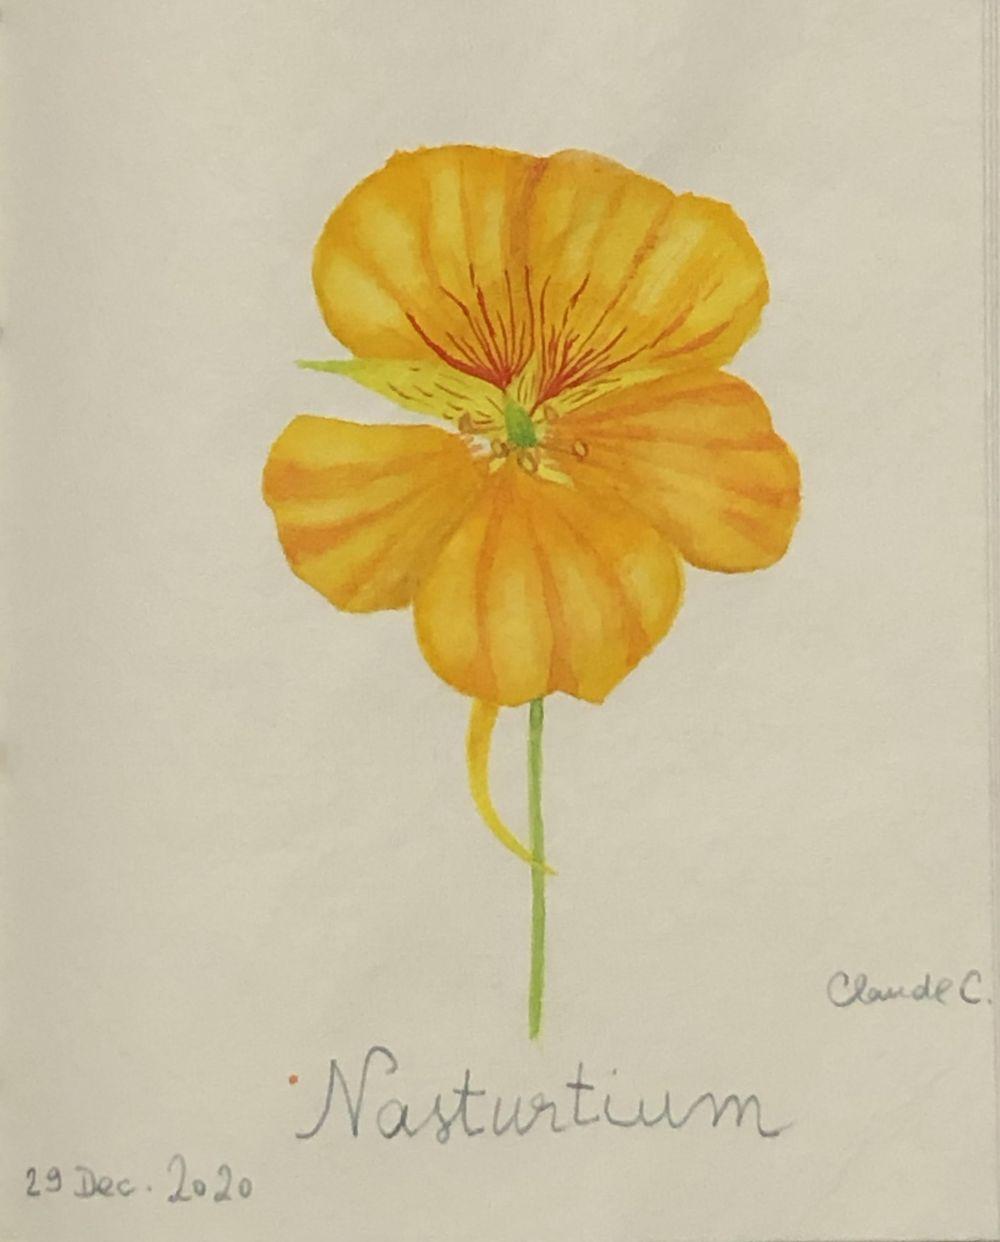 Nasturtium Flower - image 1 - student project